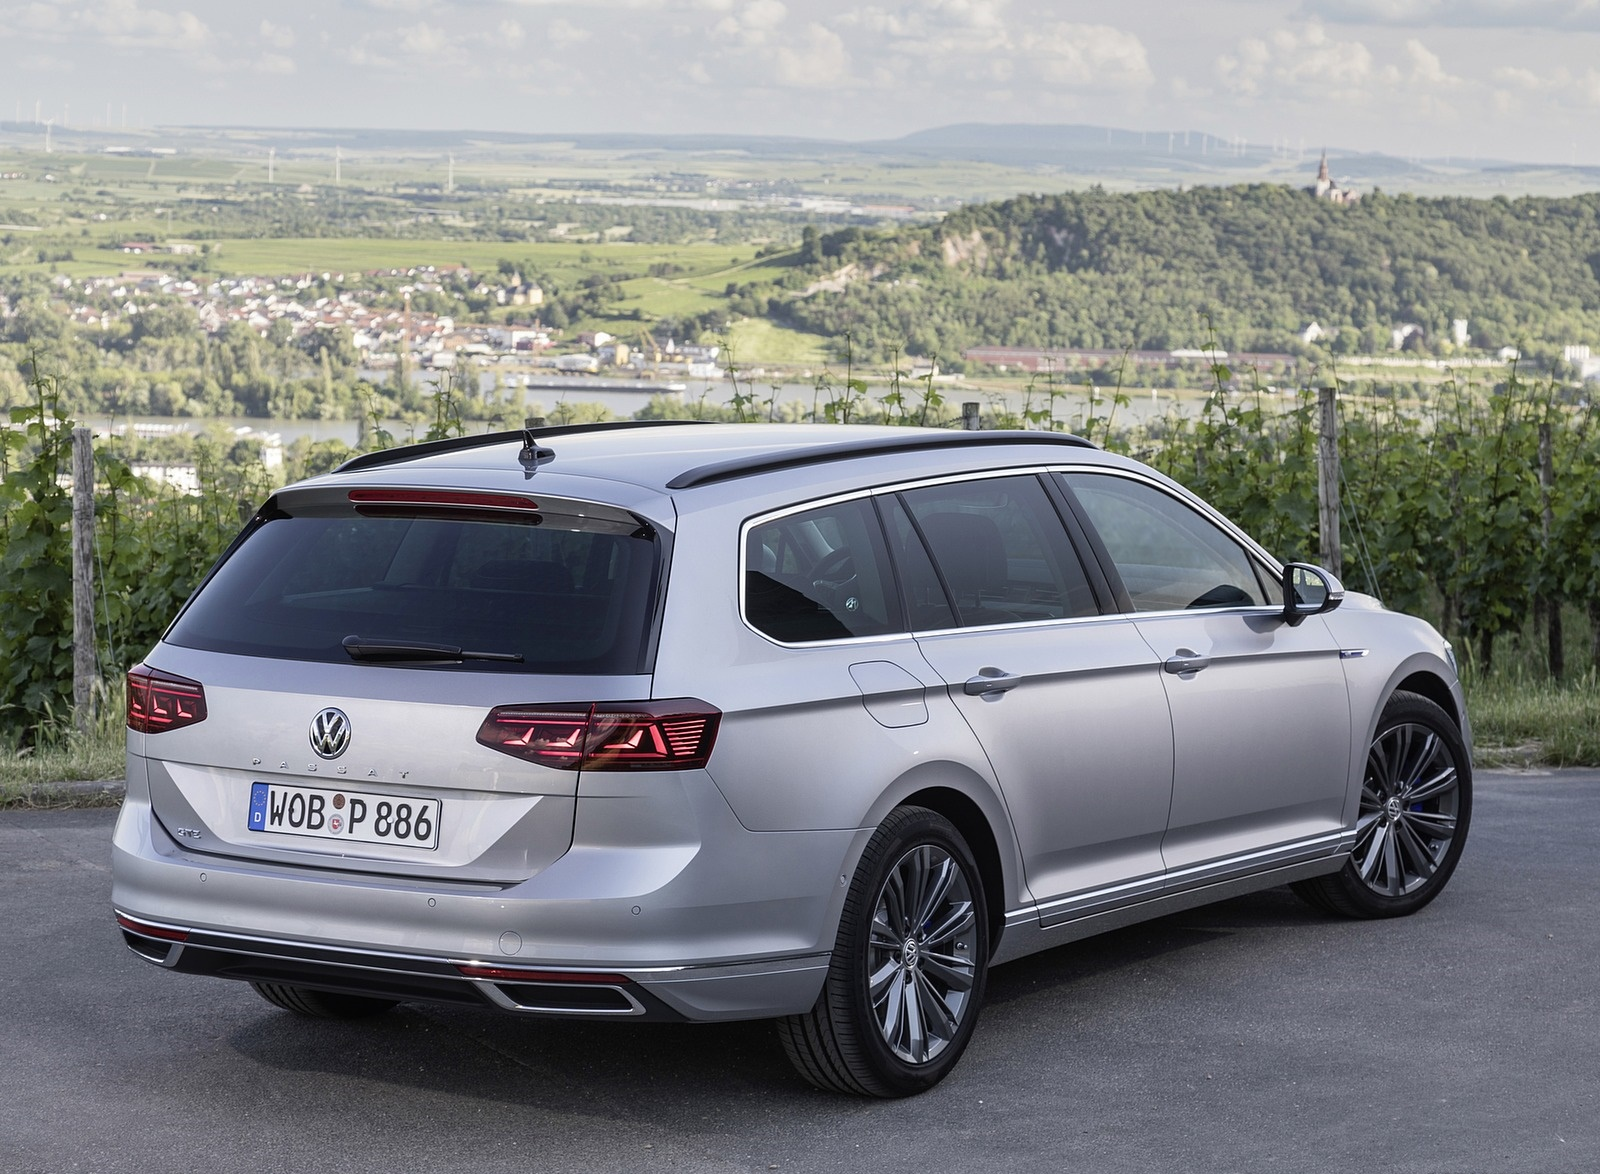 2020 Volkswagen Passat GTE Variant (Plug-In Hybrid EU-Spec) Rear Three-Quarter Wallpapers (13)